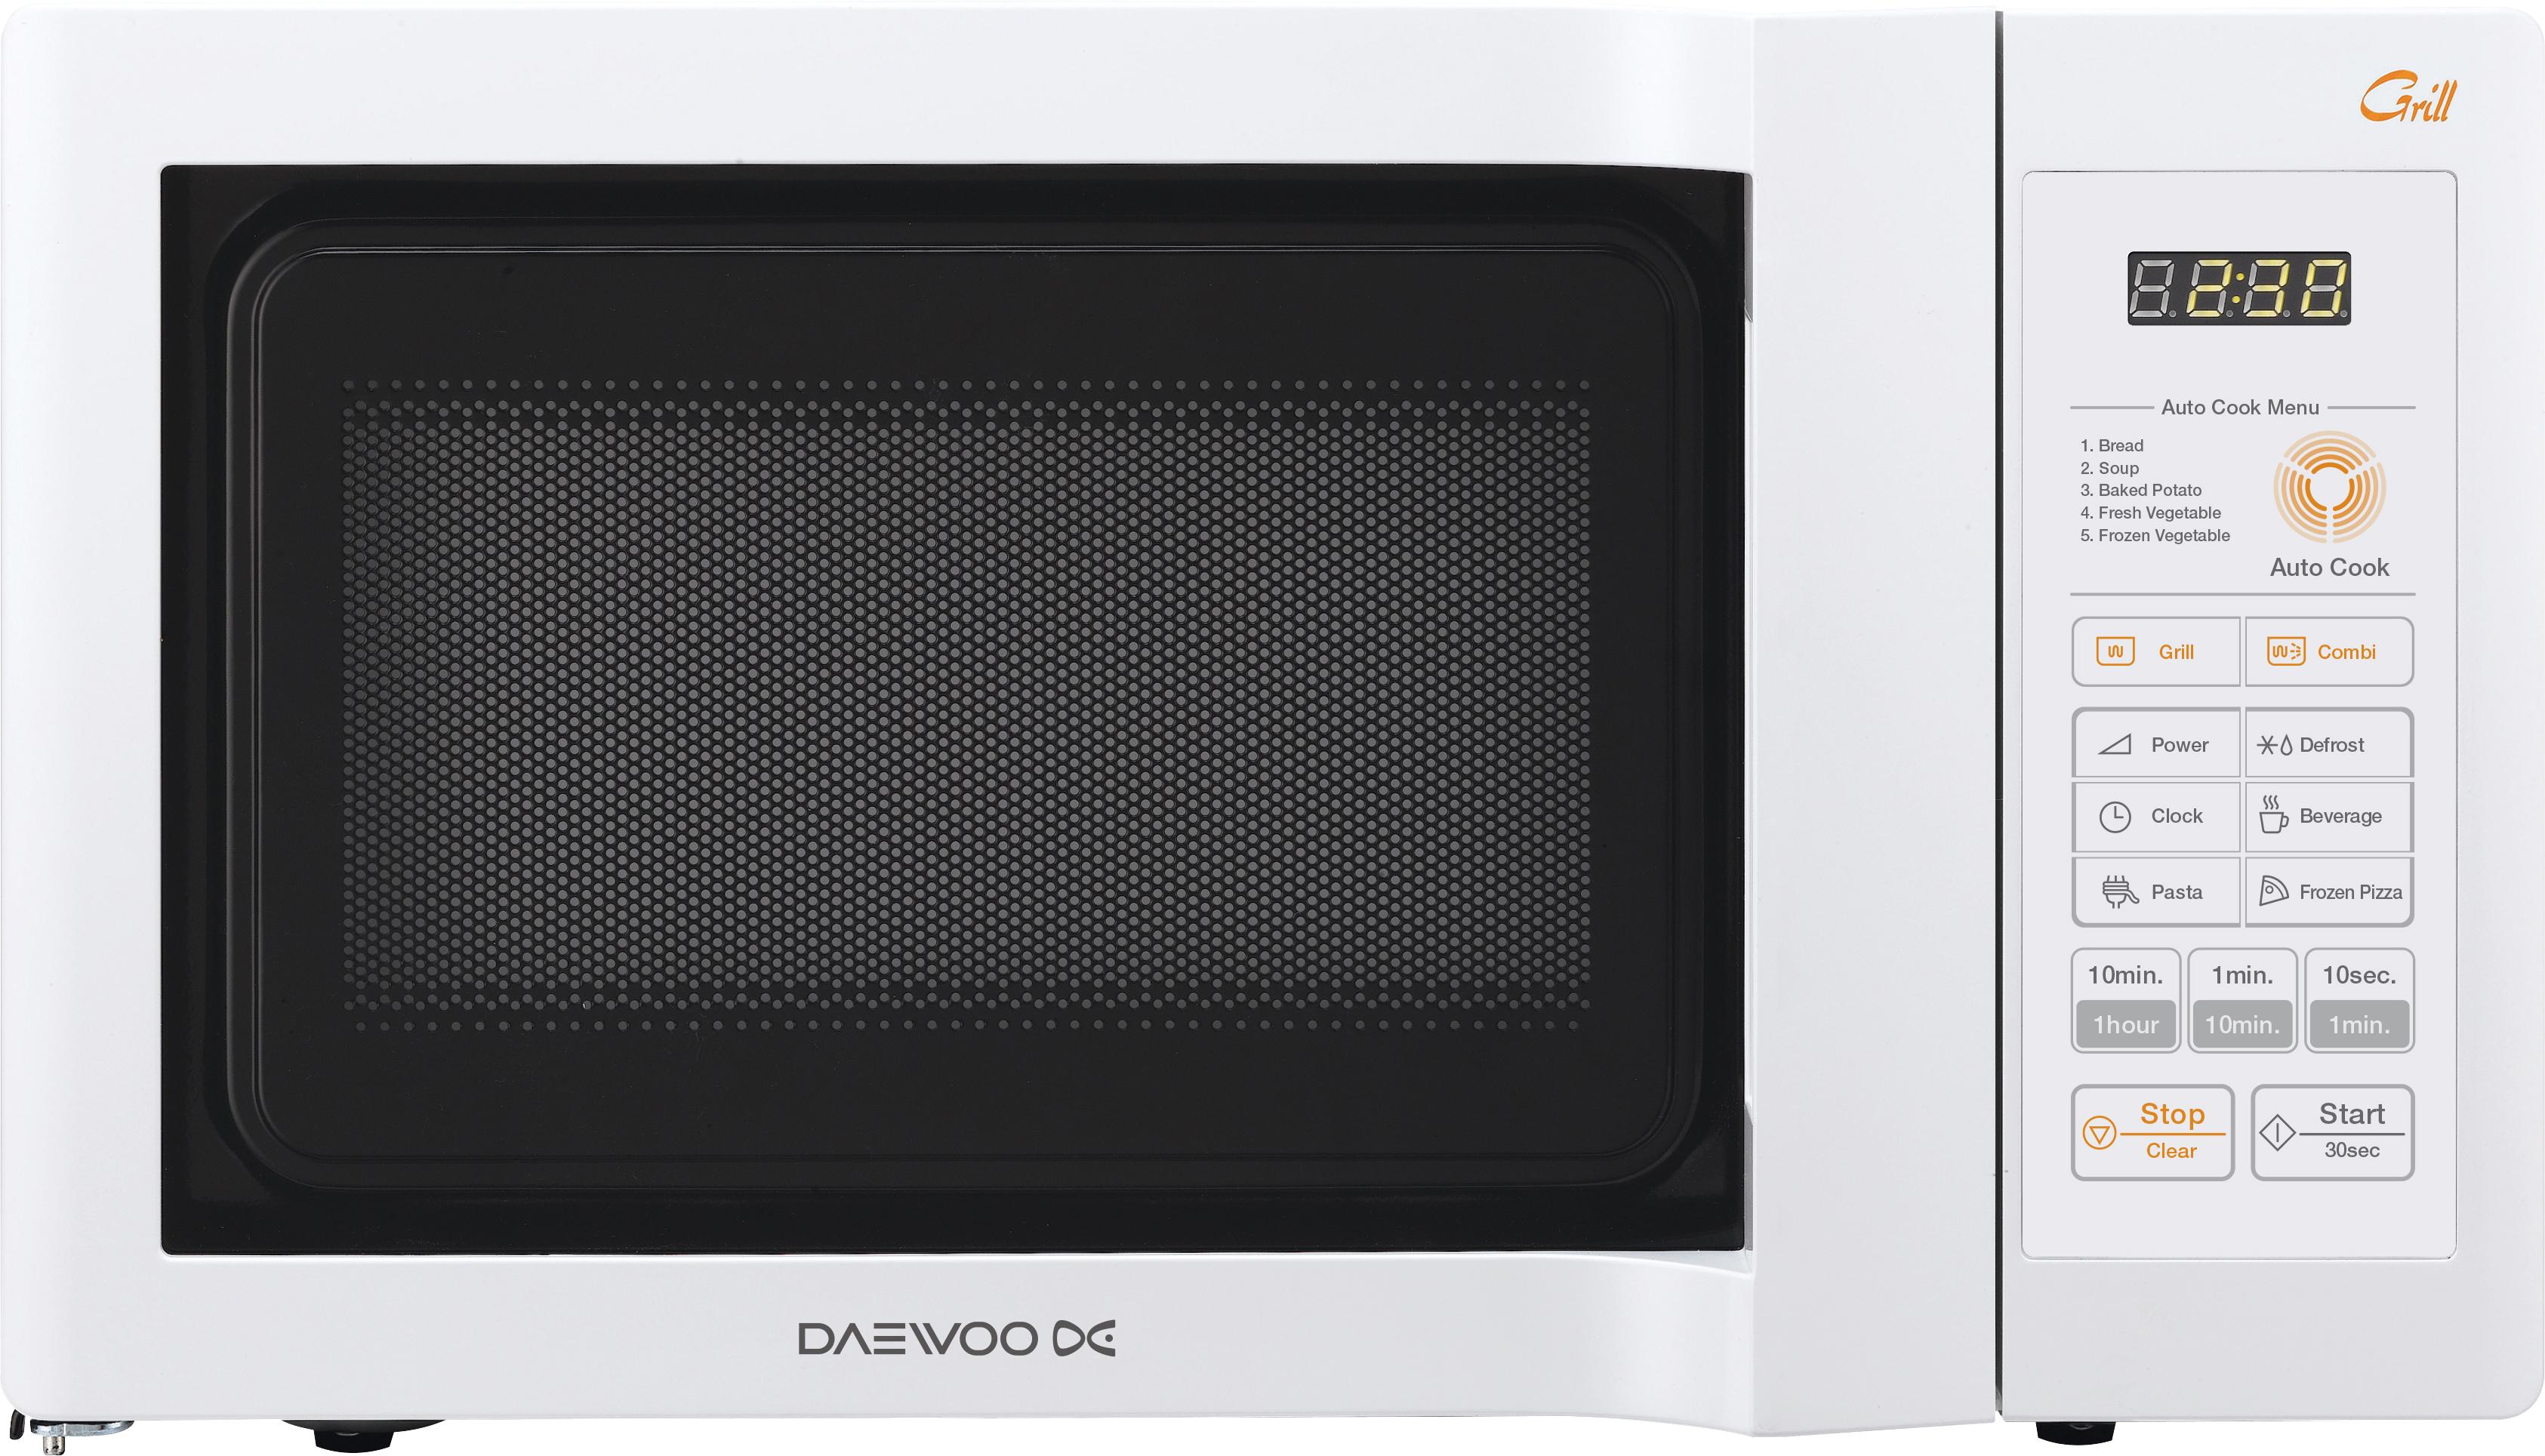 DAEWOO KQG 6L6BW mikrovlnná trouba s grilem